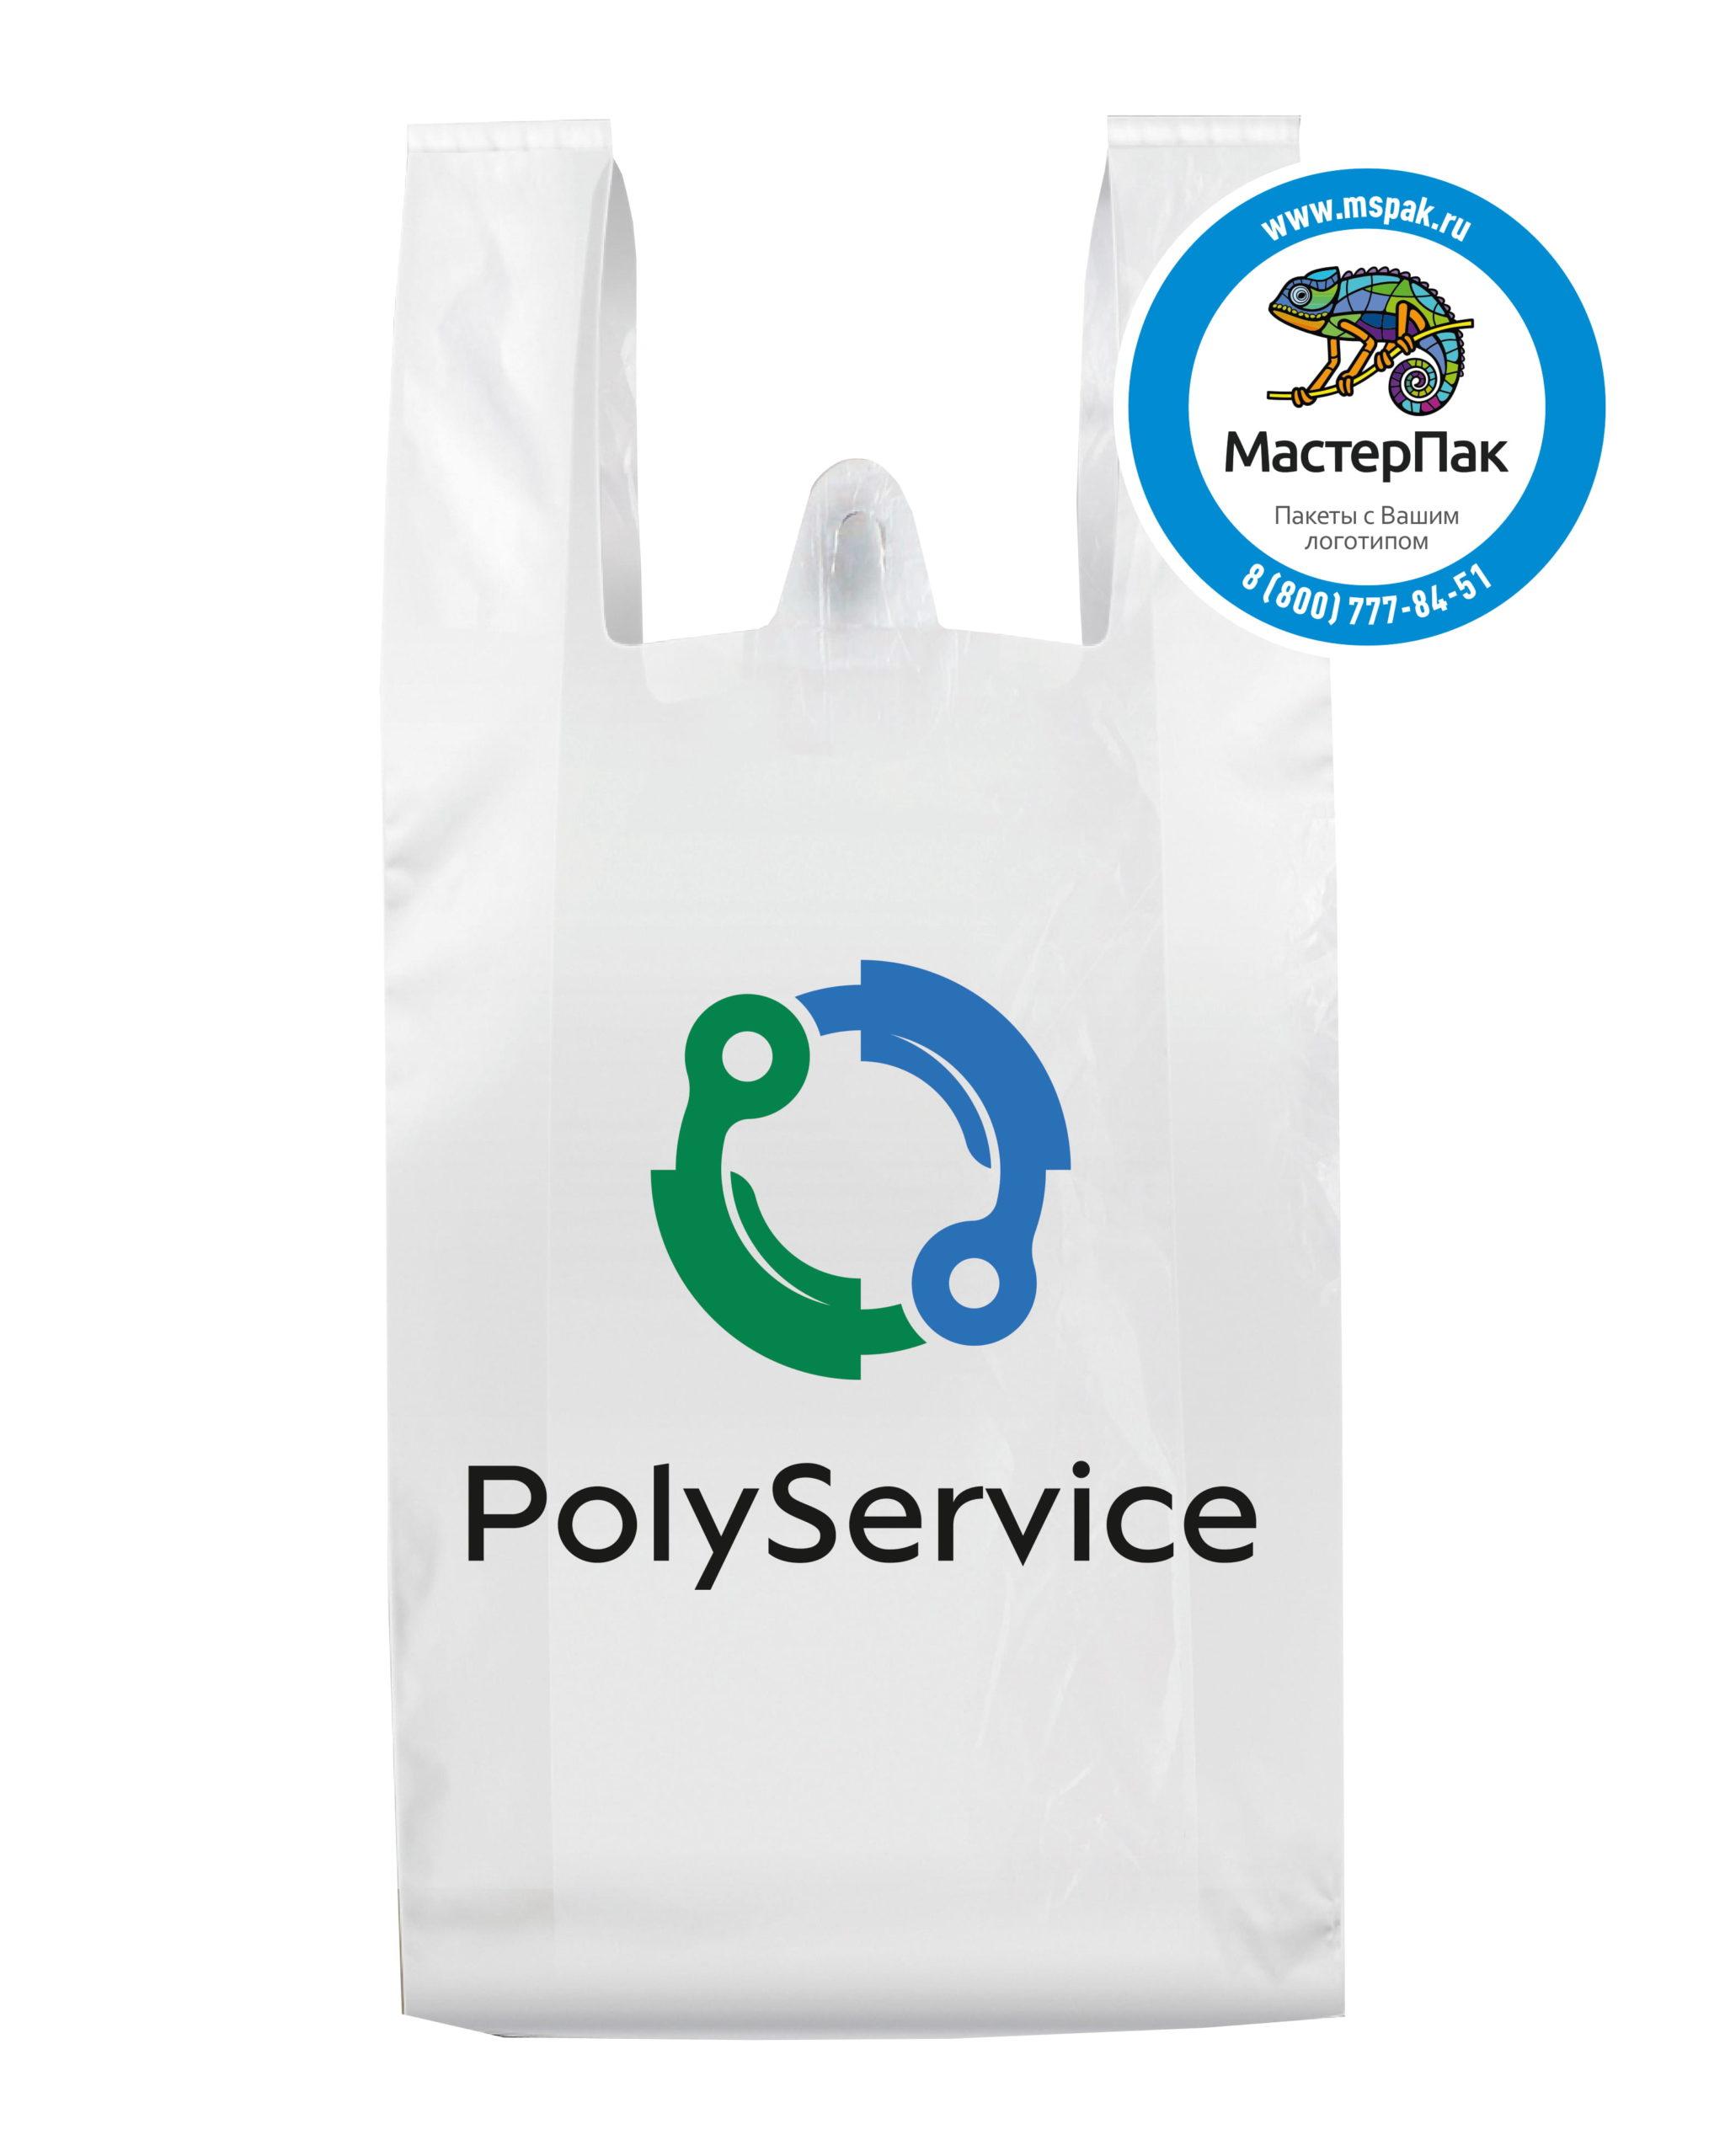 Пакет-майка ПНД с логотипом PolyService, Москва